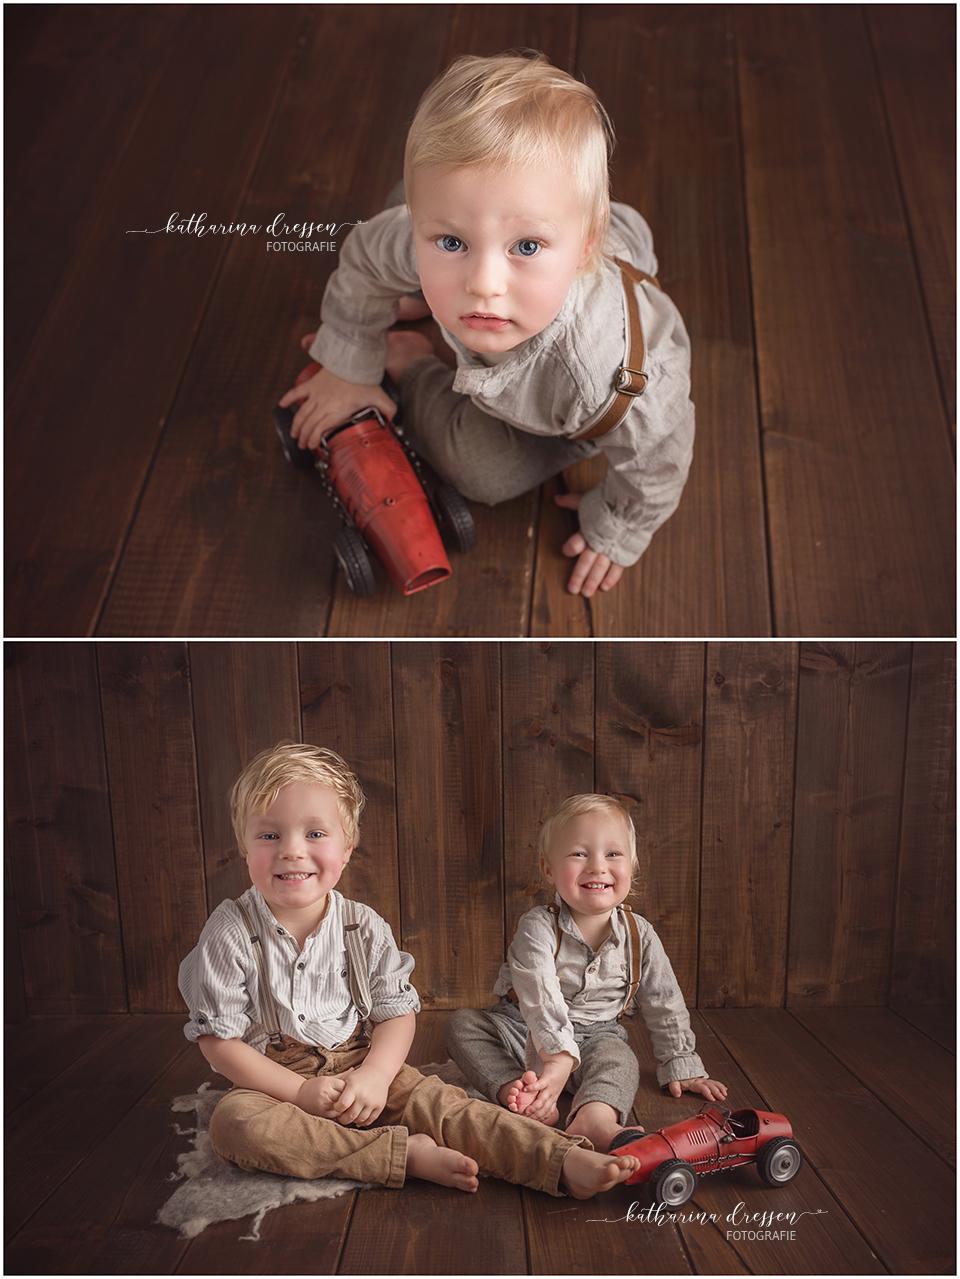 Neugeborenes_BabyFoto_Baby-Fotoshooting_babyfotograf_Geburt_Geburtshaus_Hebamme_Schwanger_Fotograf_Kinder_Kinderfotograf_Duesseldof